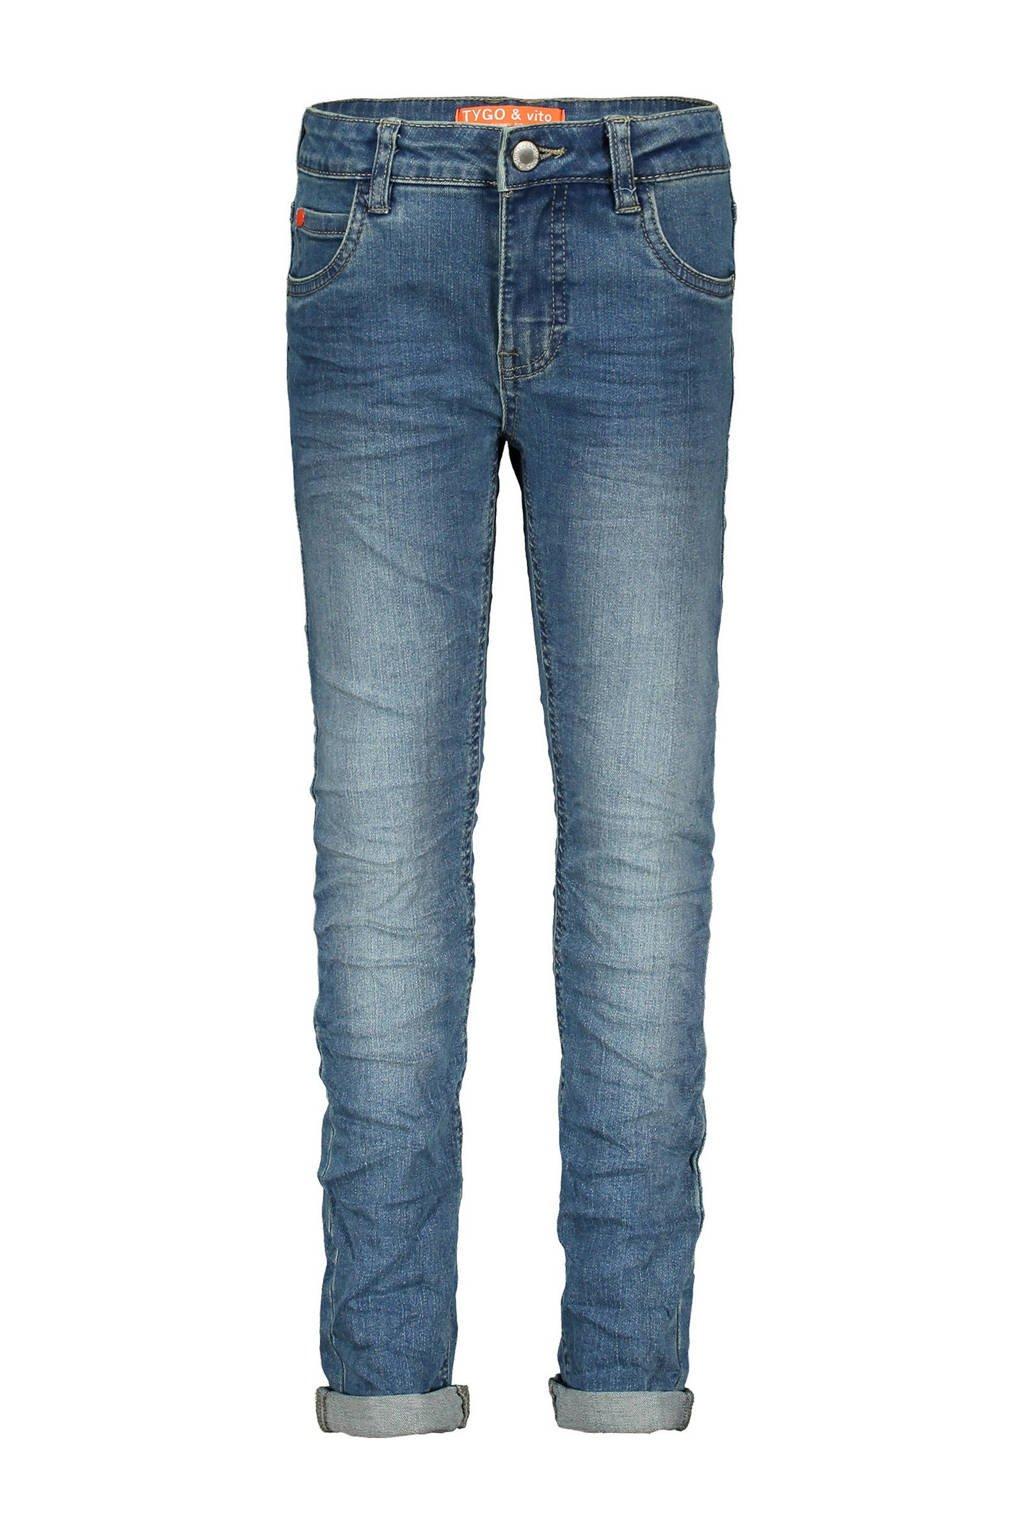 TYGO & vito skinny fit jeans light denim vintage, Light denim vintage